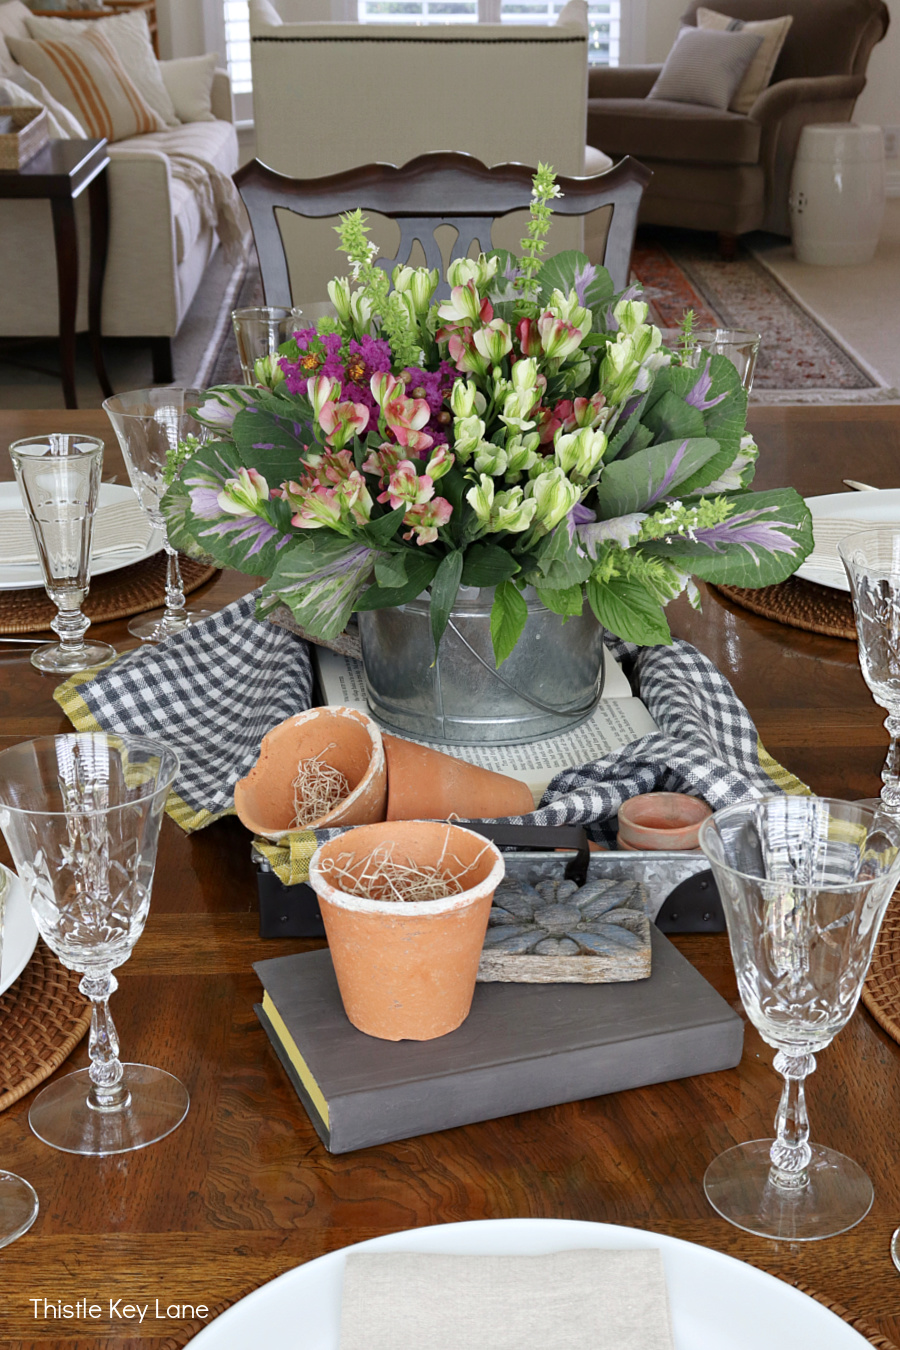 Galvanized tray and terra cotta pots in a garden centerpiece.